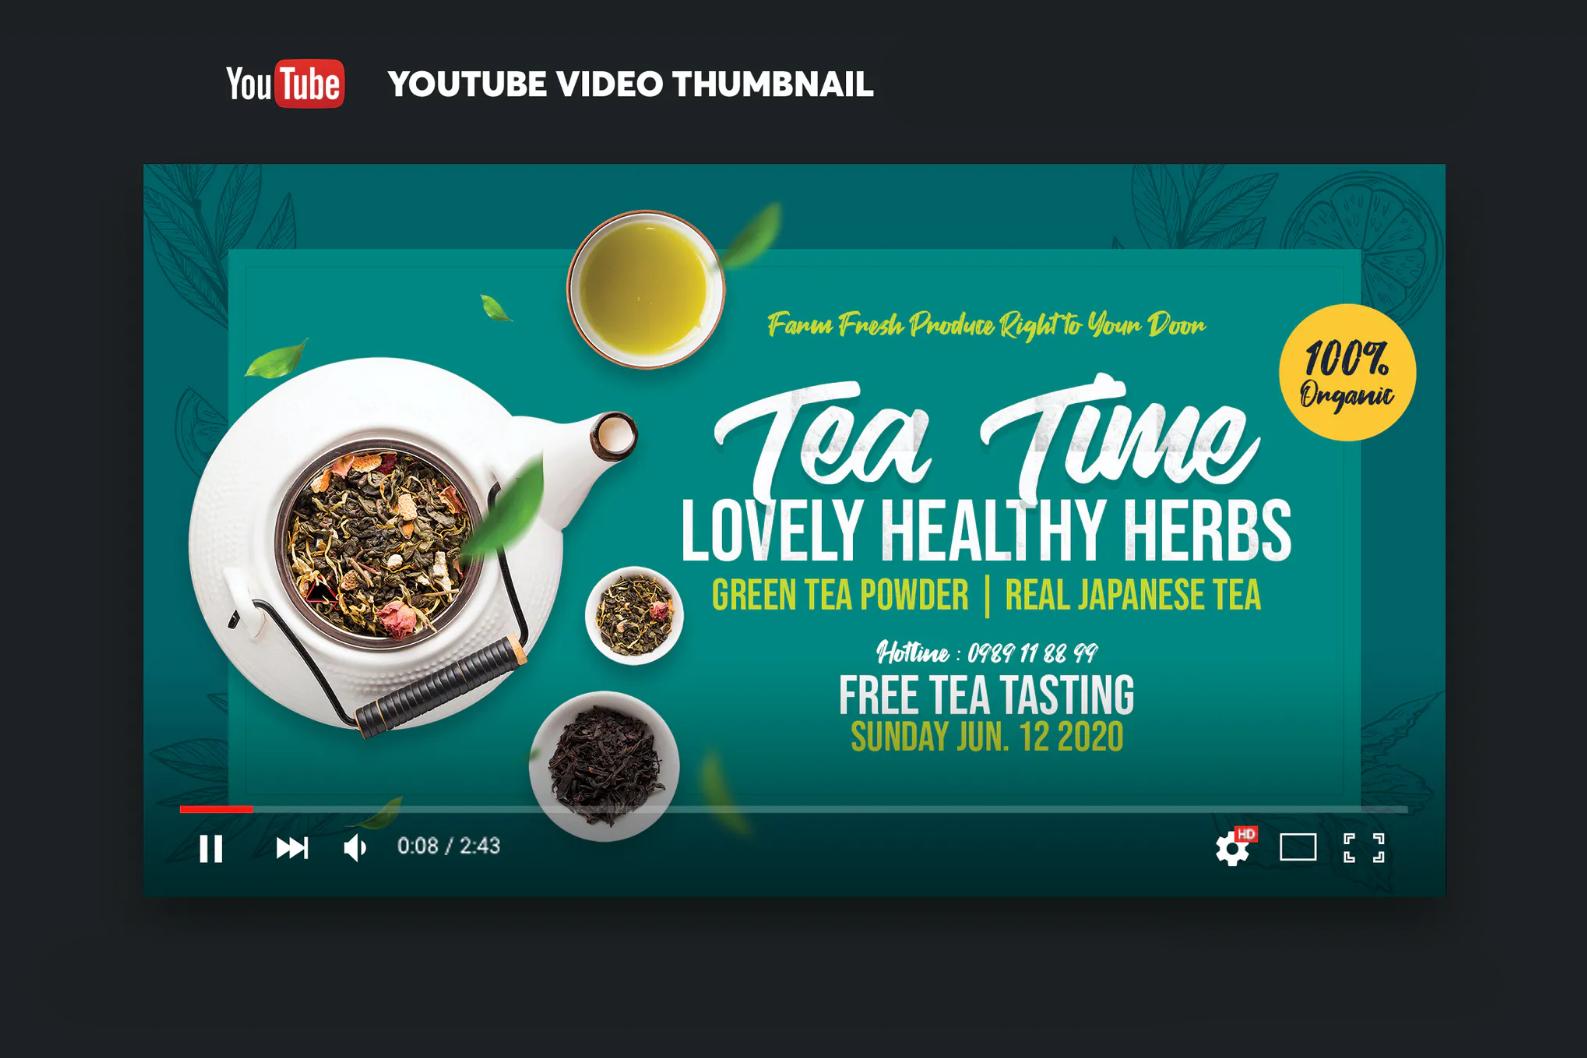 Screenshot 2021-06-16 at 04-43-20 Green Tea YouTube Video Thumbnail Screenshot by YummyDs on Envato Elements